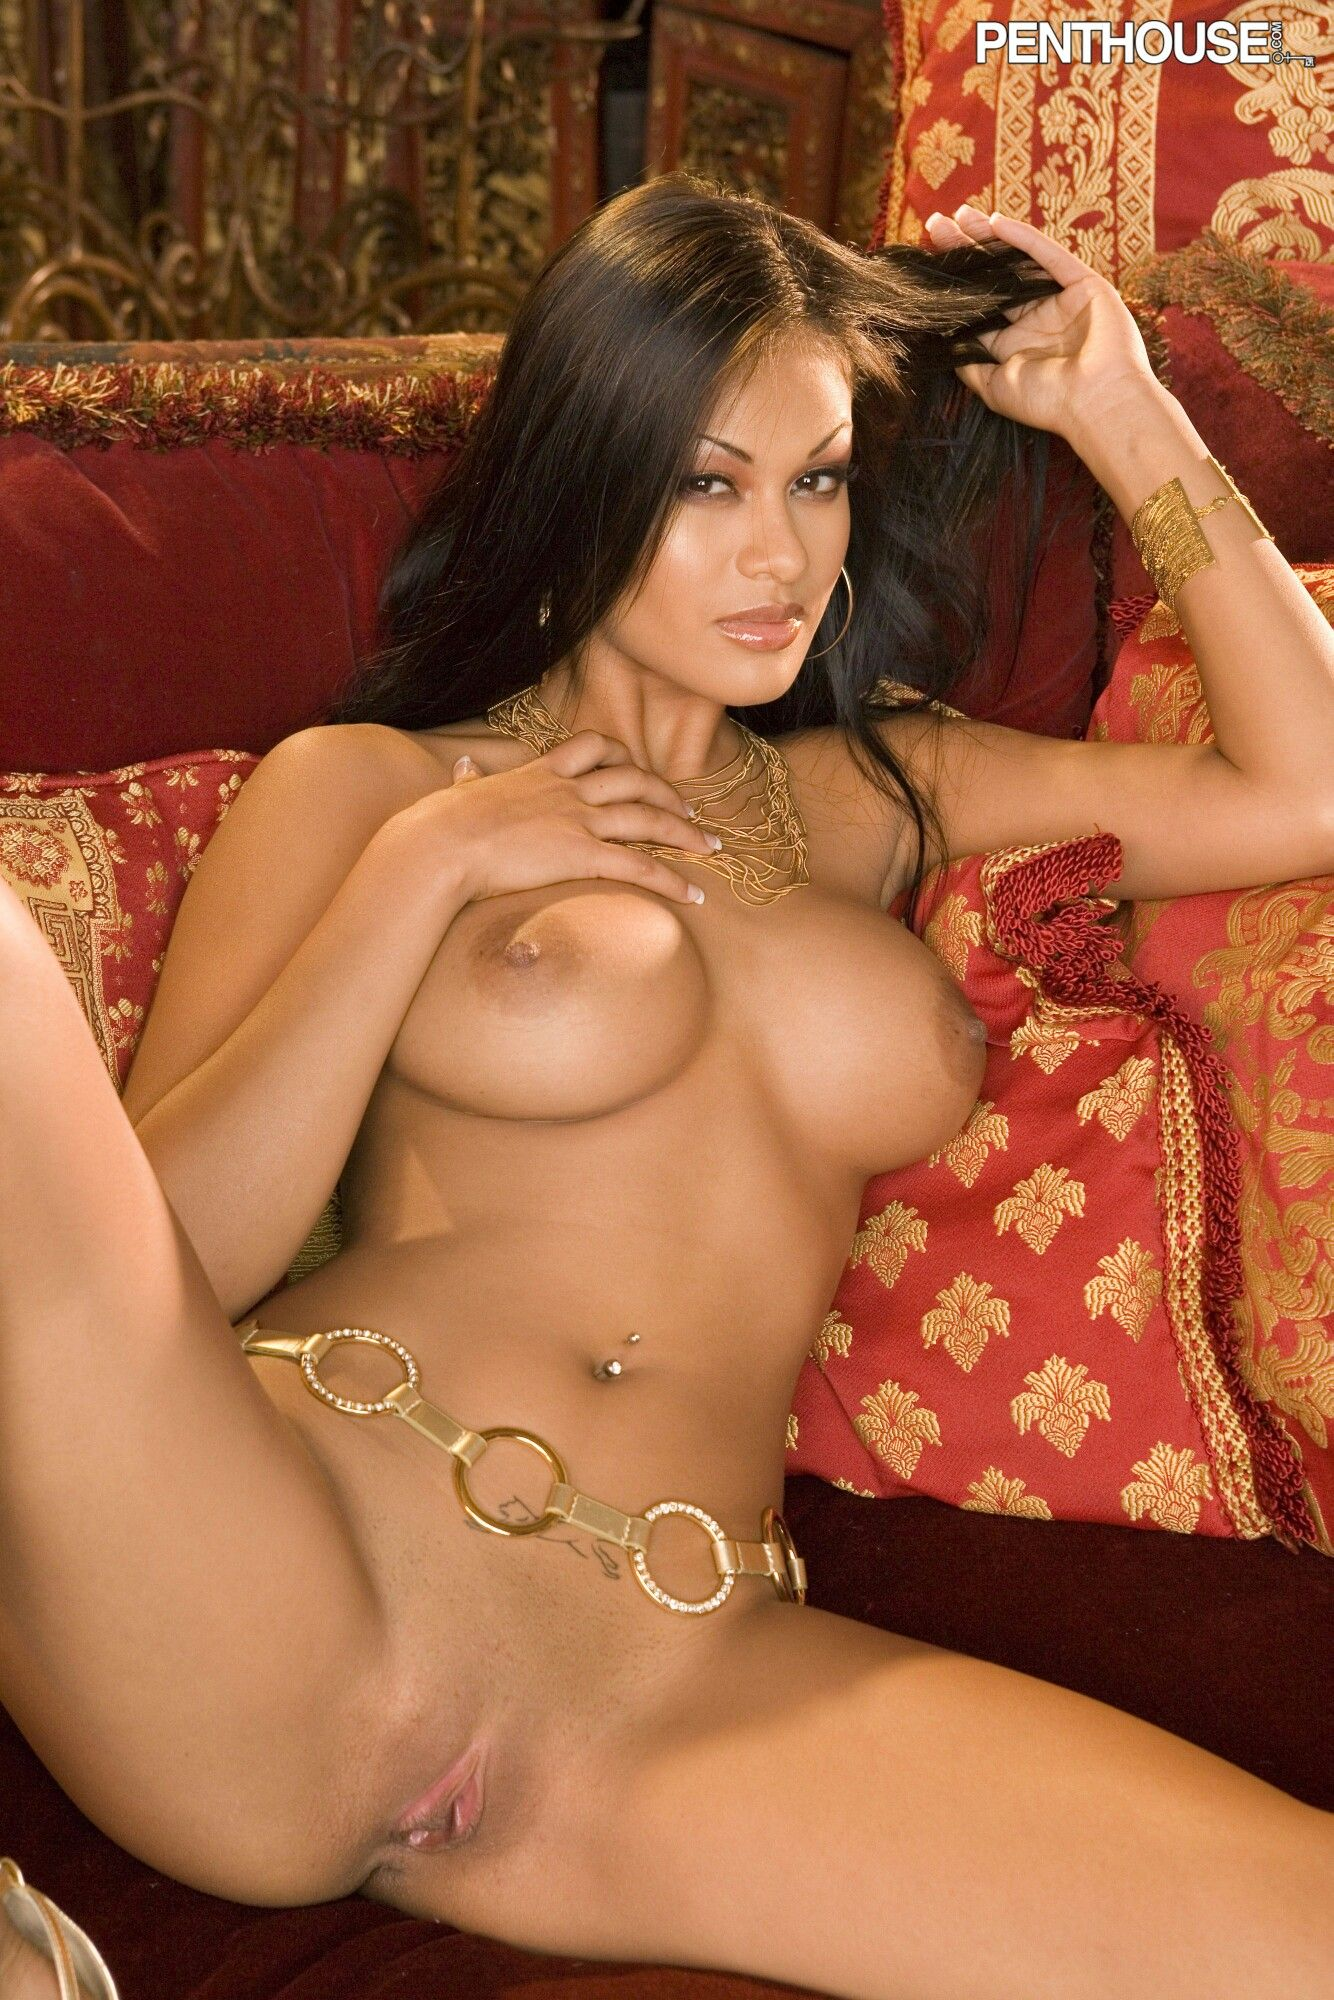 sextime naked girls photo